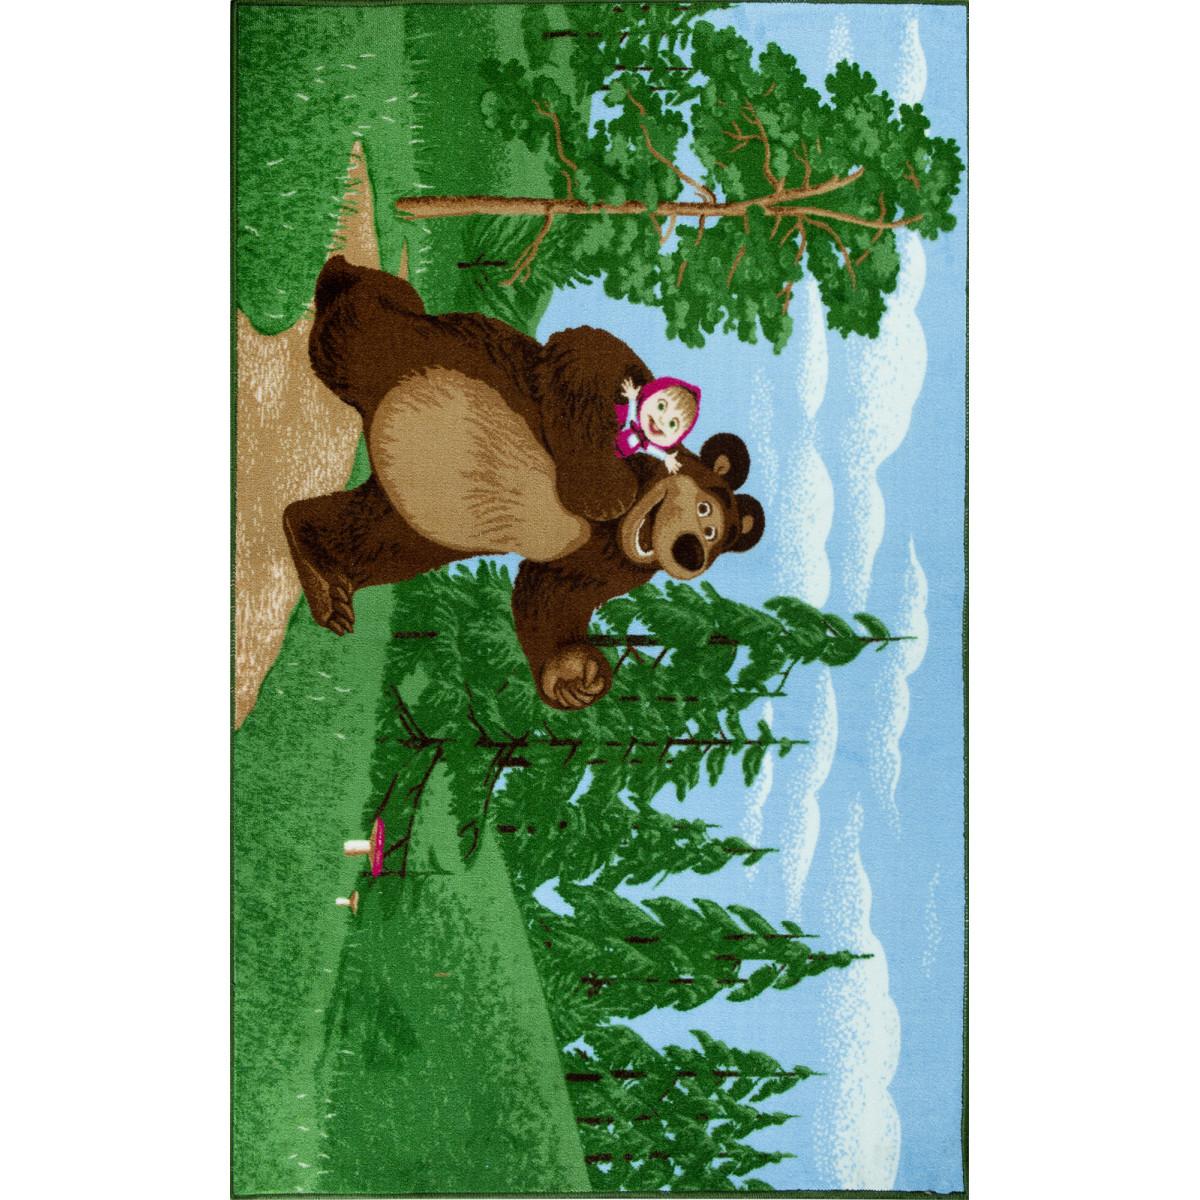 Ковер Маша и Медведь в лесу 1х1.5 м